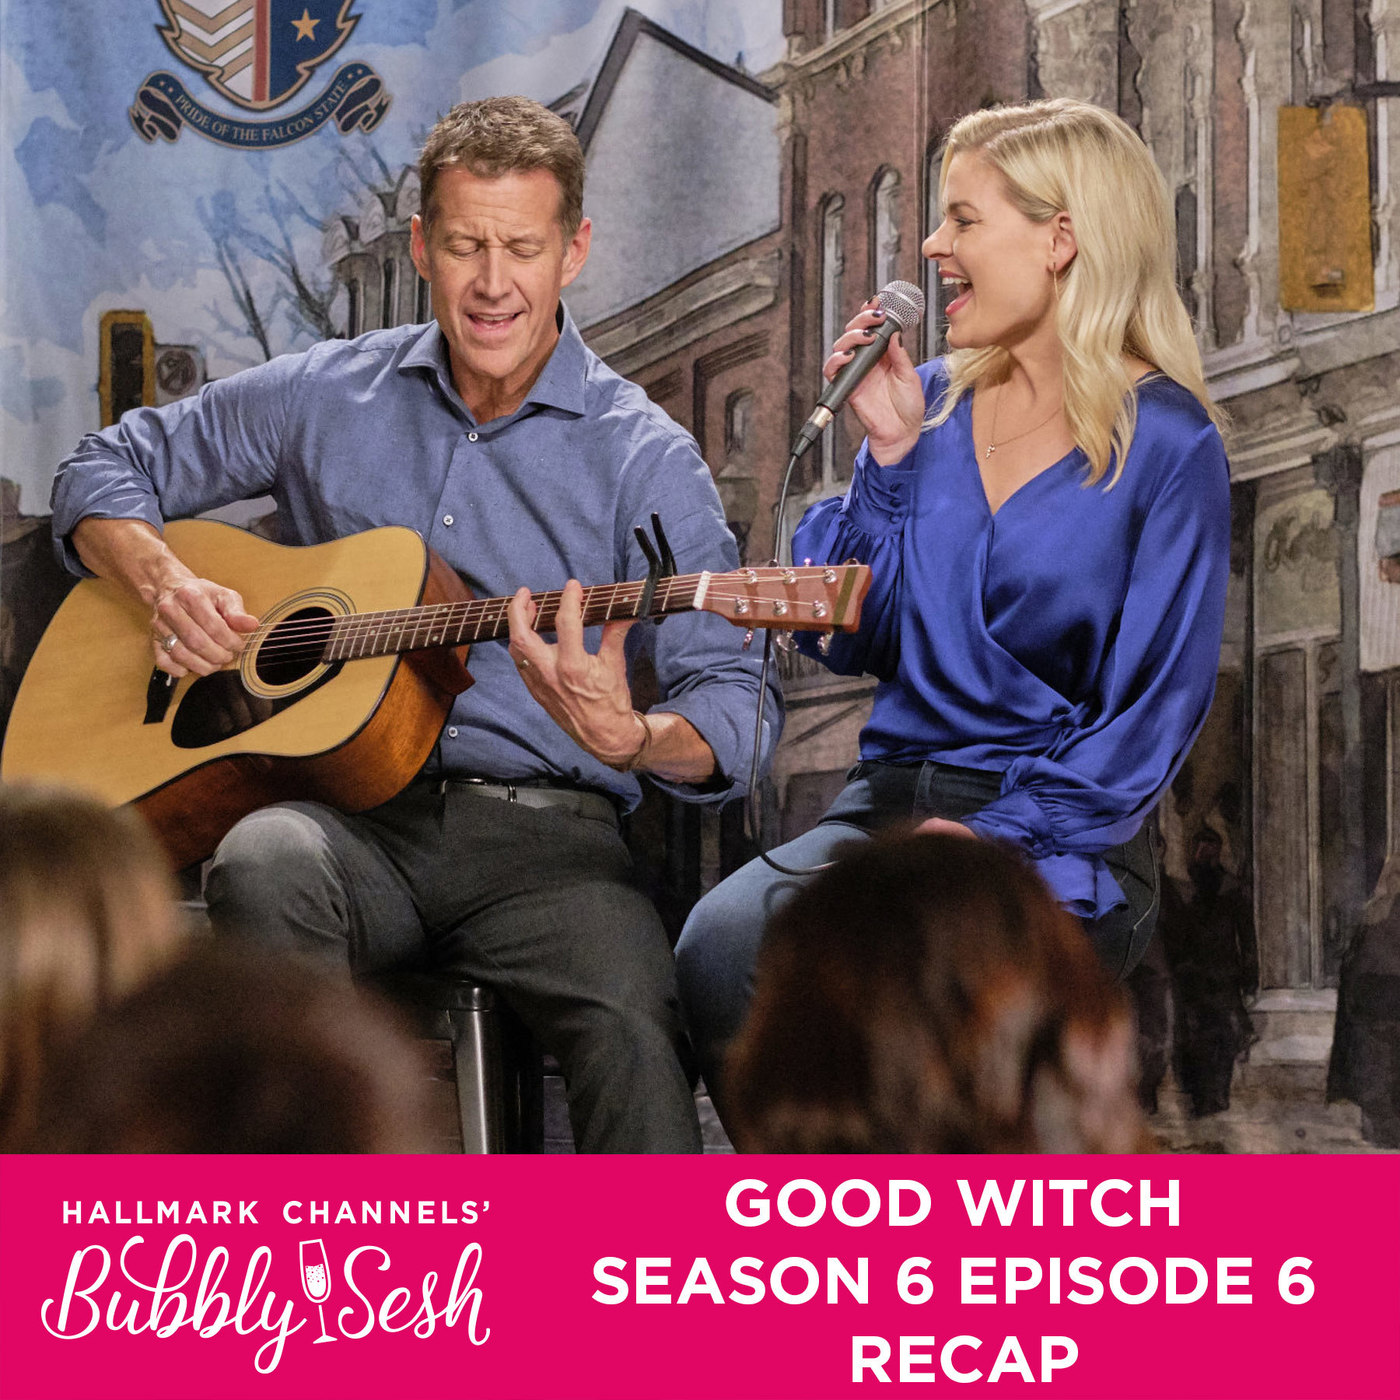 Good Witch Season 6 Episode 6 Recap